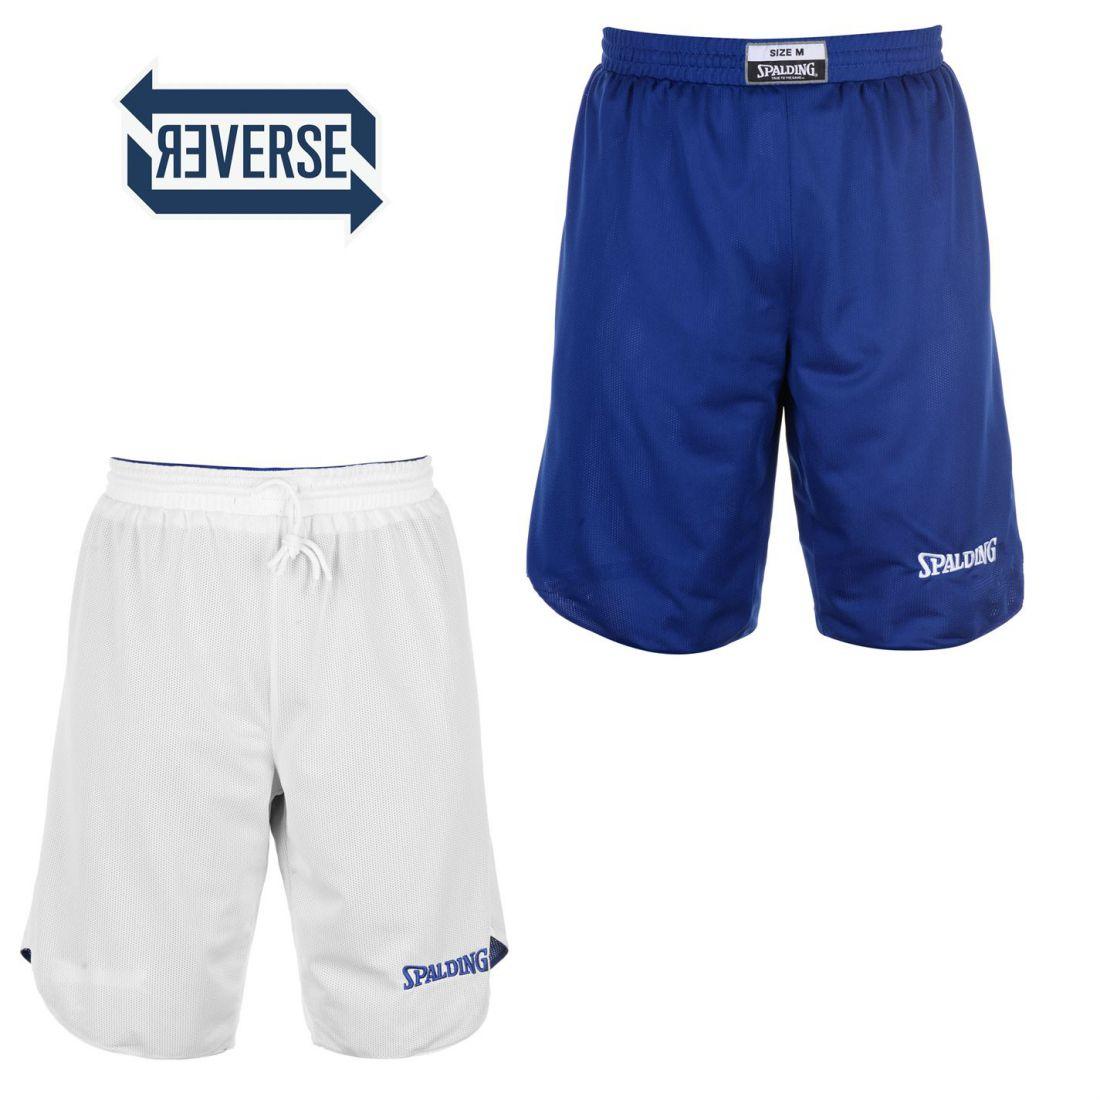 0b71a1245e31 Spalding Mens Reversible Basketball Shorts Pants Trousers Bottoms ...